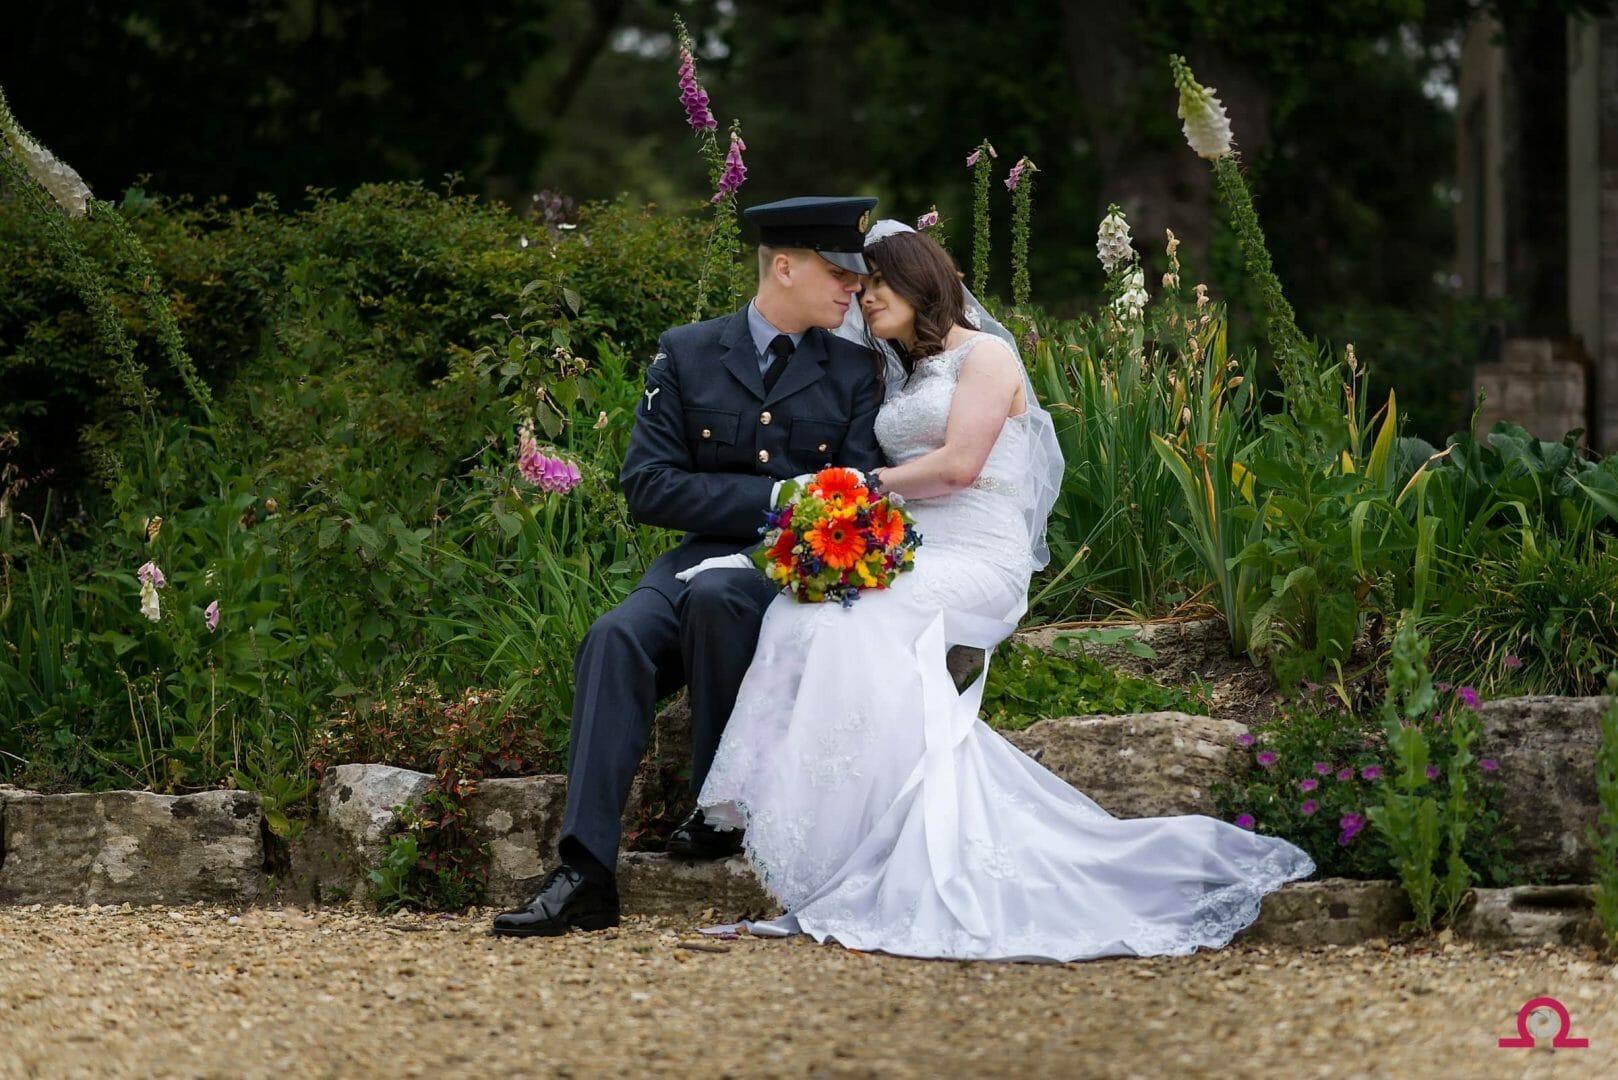 Koi-pond-bournemouth-wedding-photography